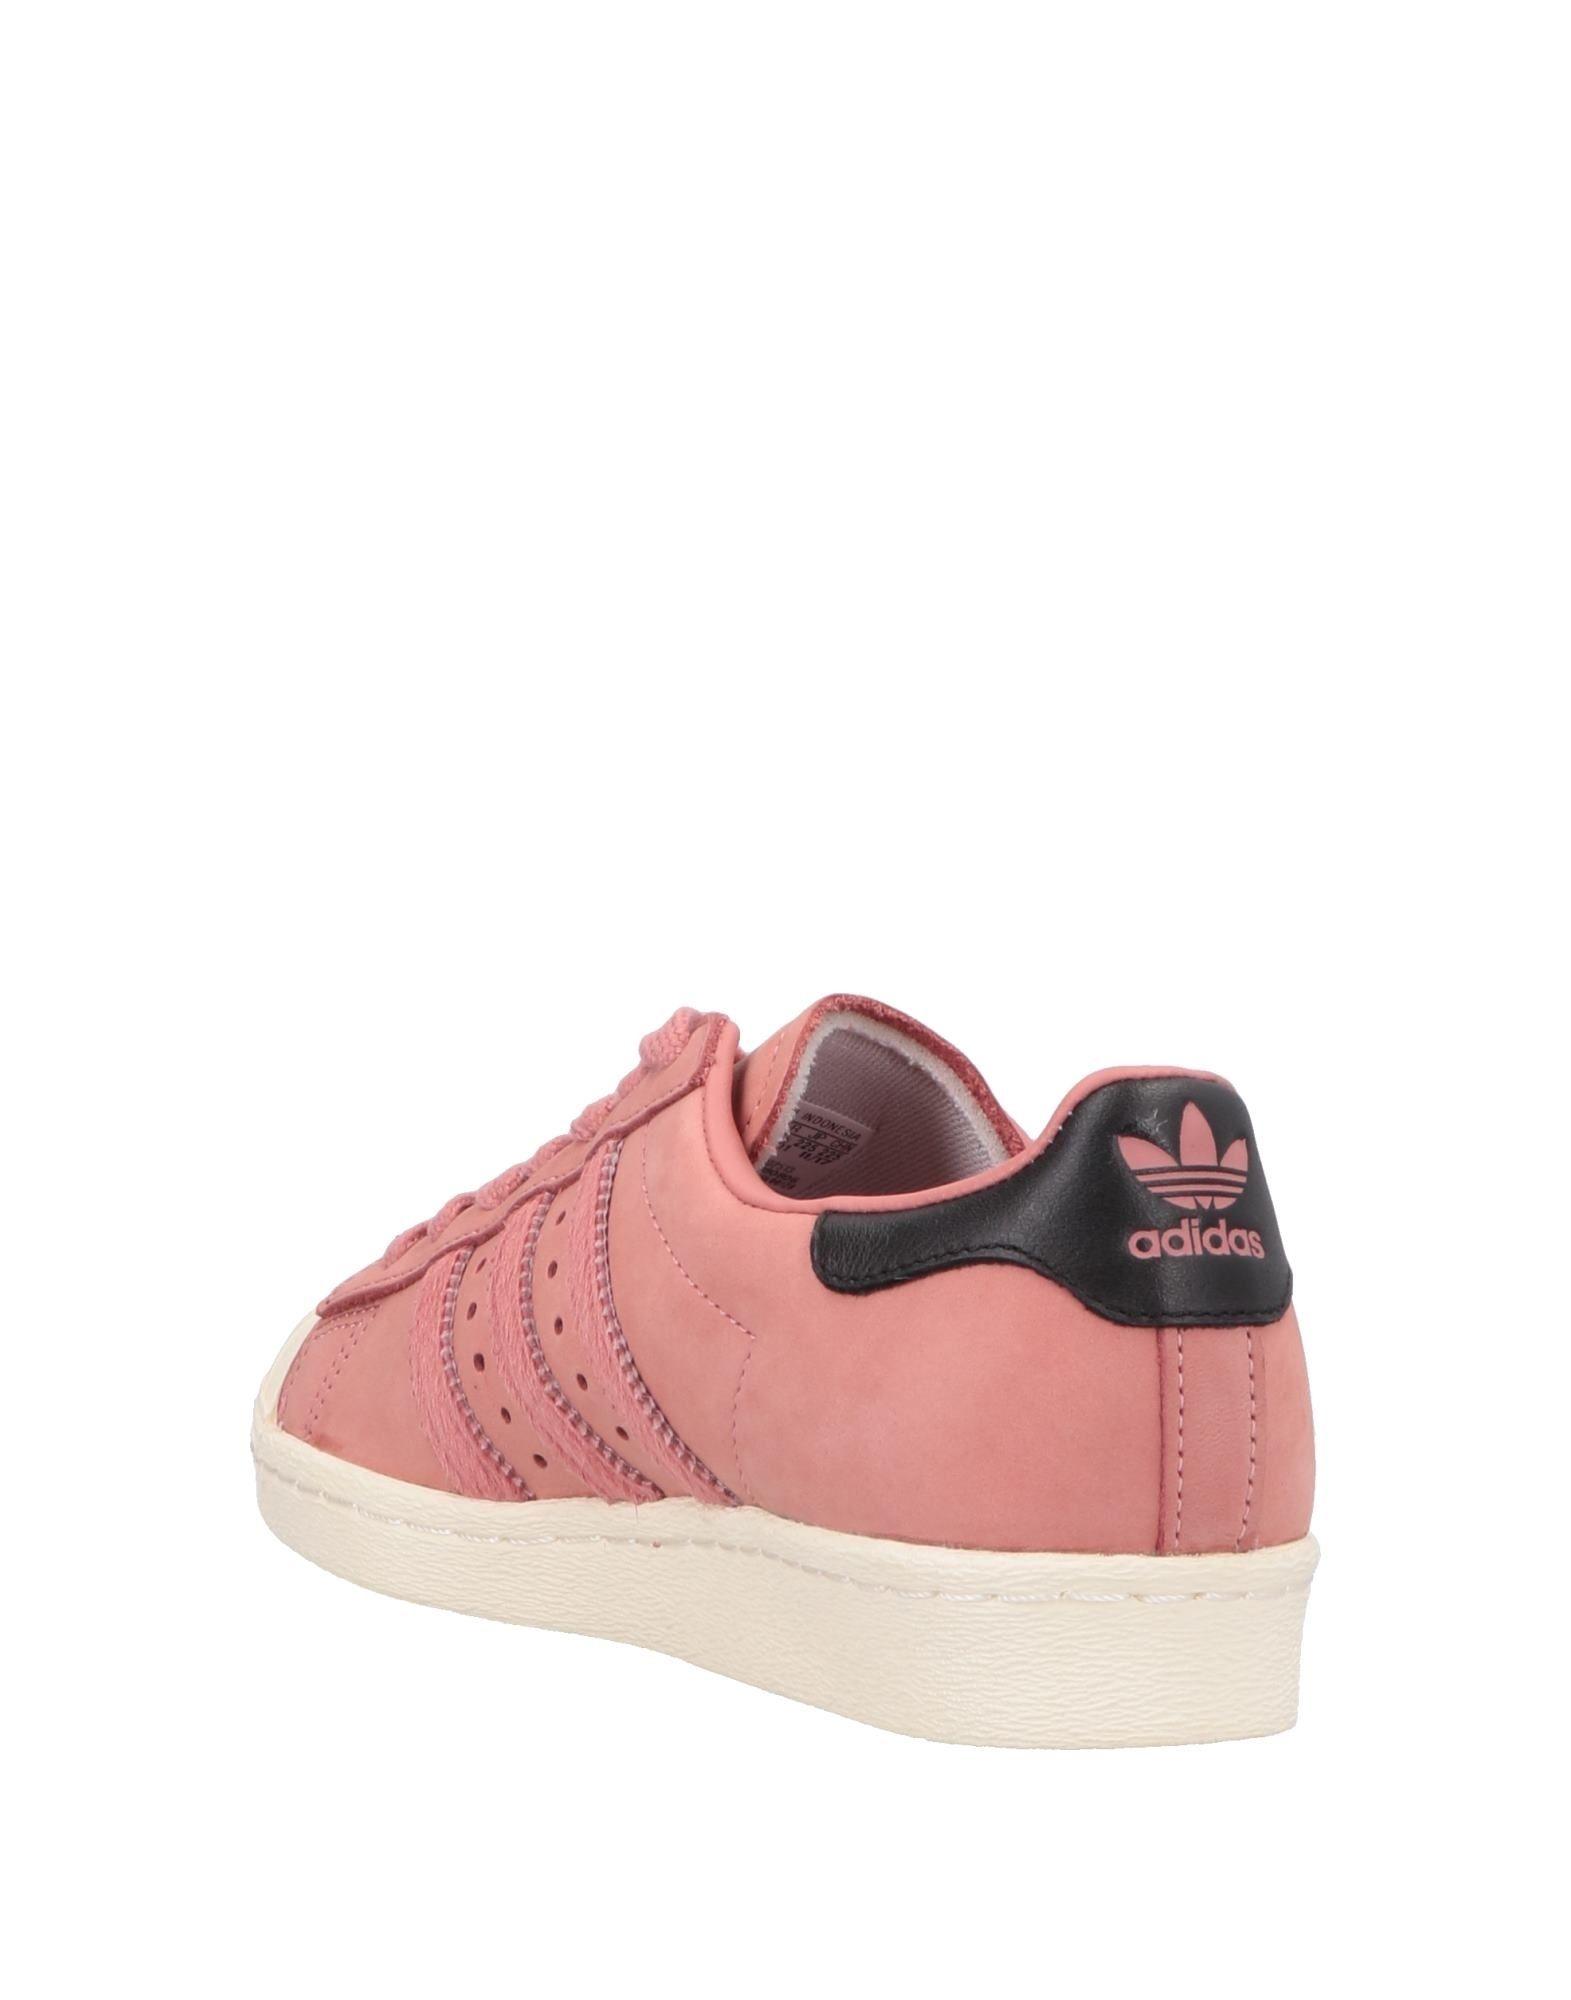 Adidas Originals Qualität Turnschuhes Damen 11584896AC Gute Qualität Originals beliebte Schuhe 559144